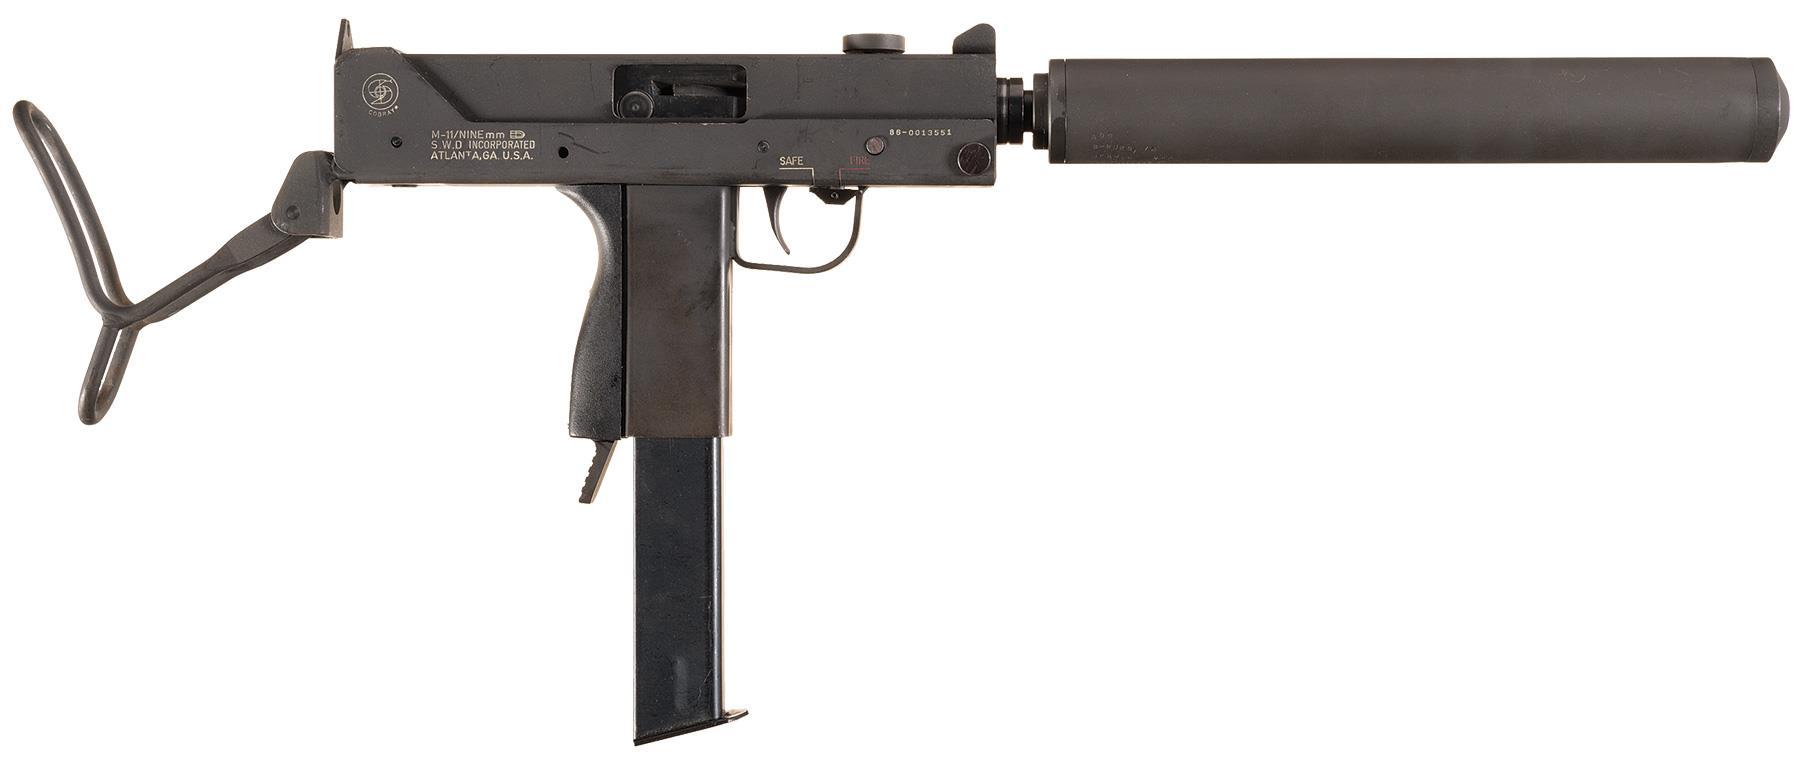 SWD Cobray M-11 Class III/NFA Sub-Machine Gun